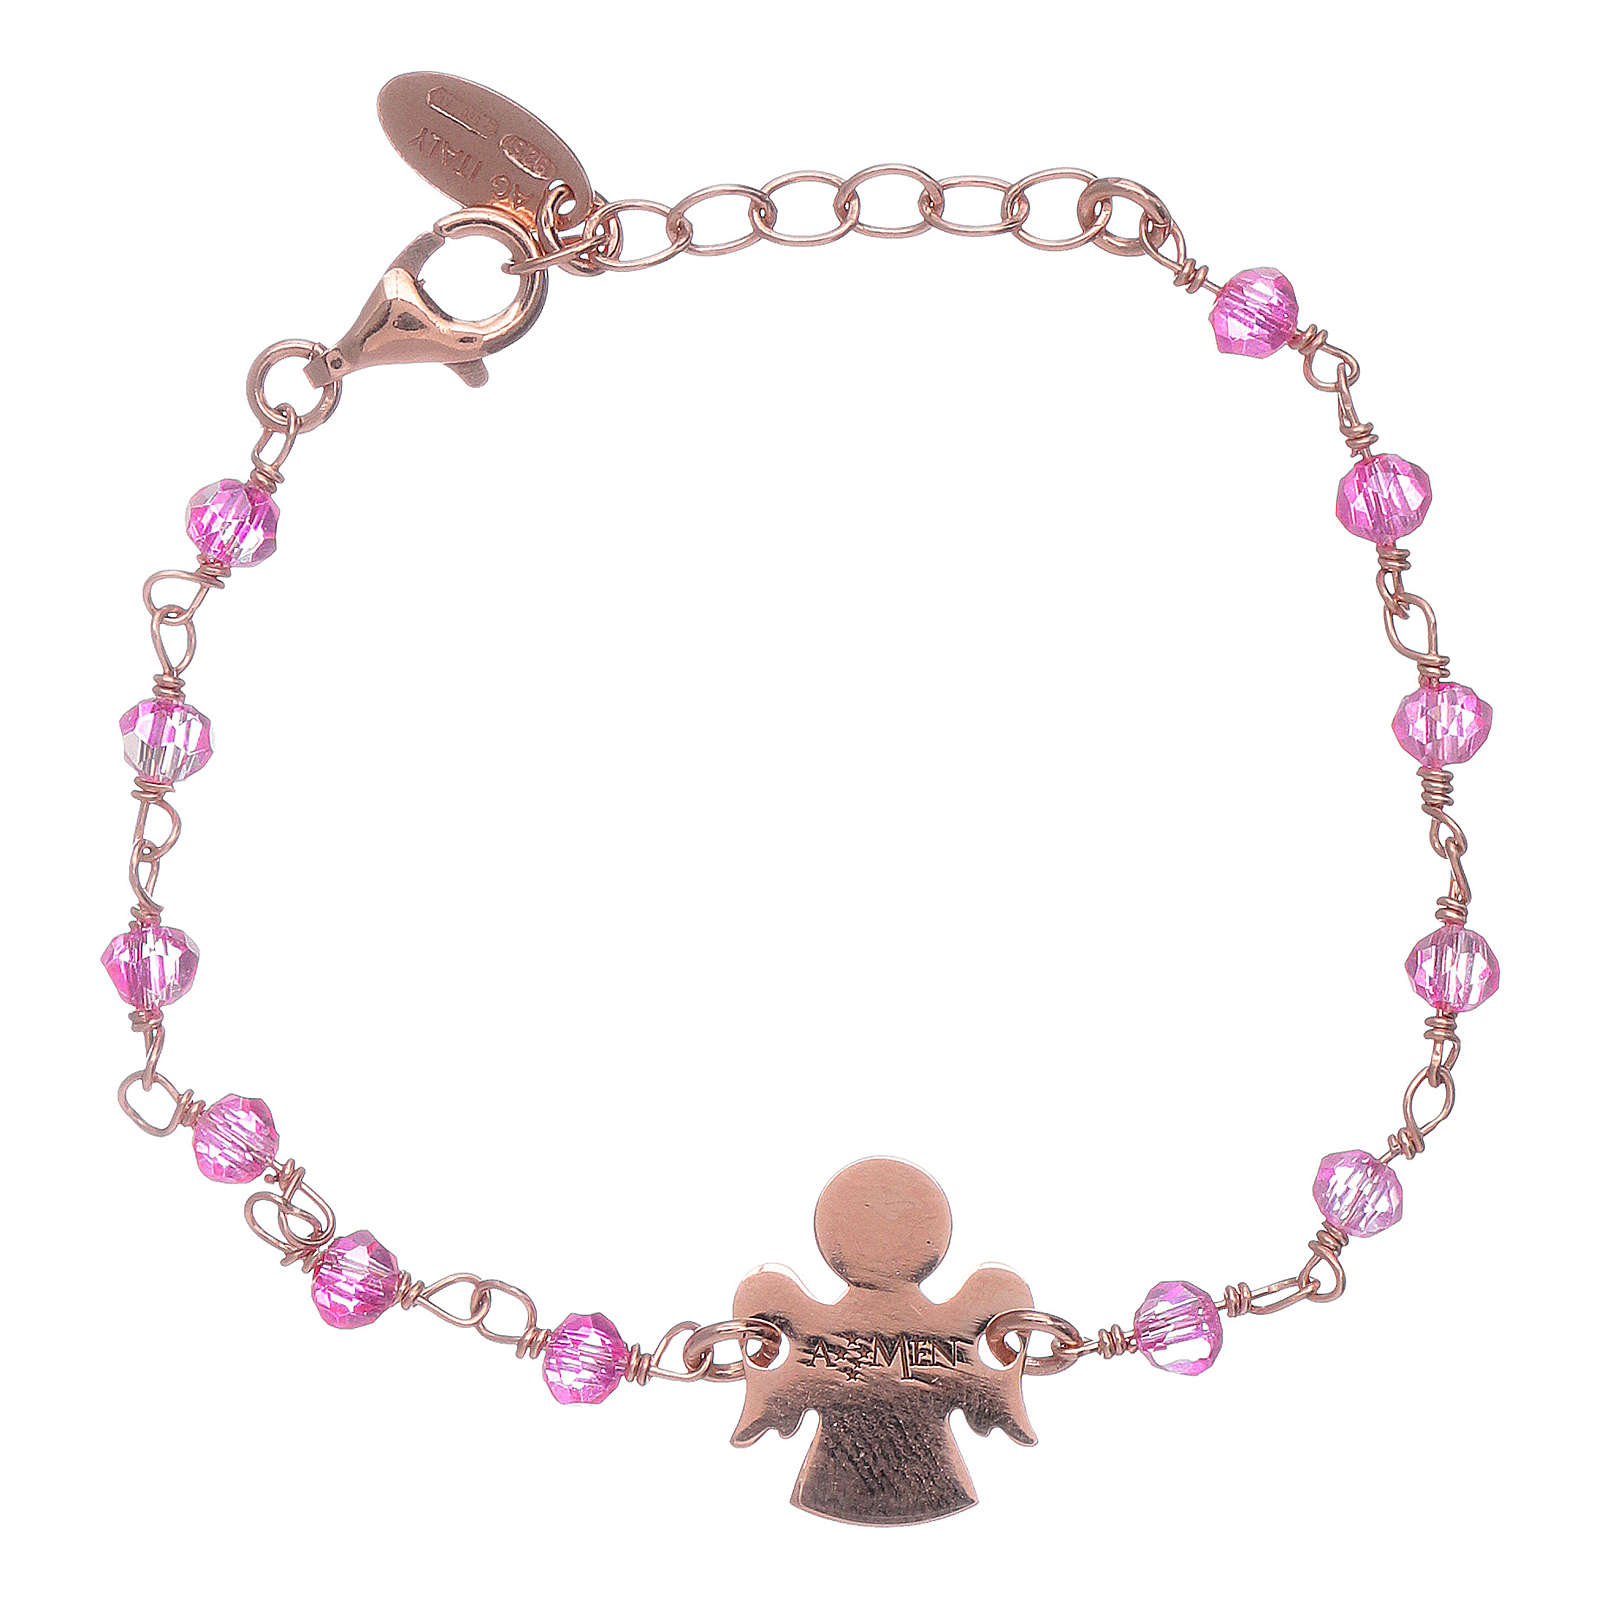 AMEN 925 sterling silver bracelet with Swarovski pearls and angel insert 4